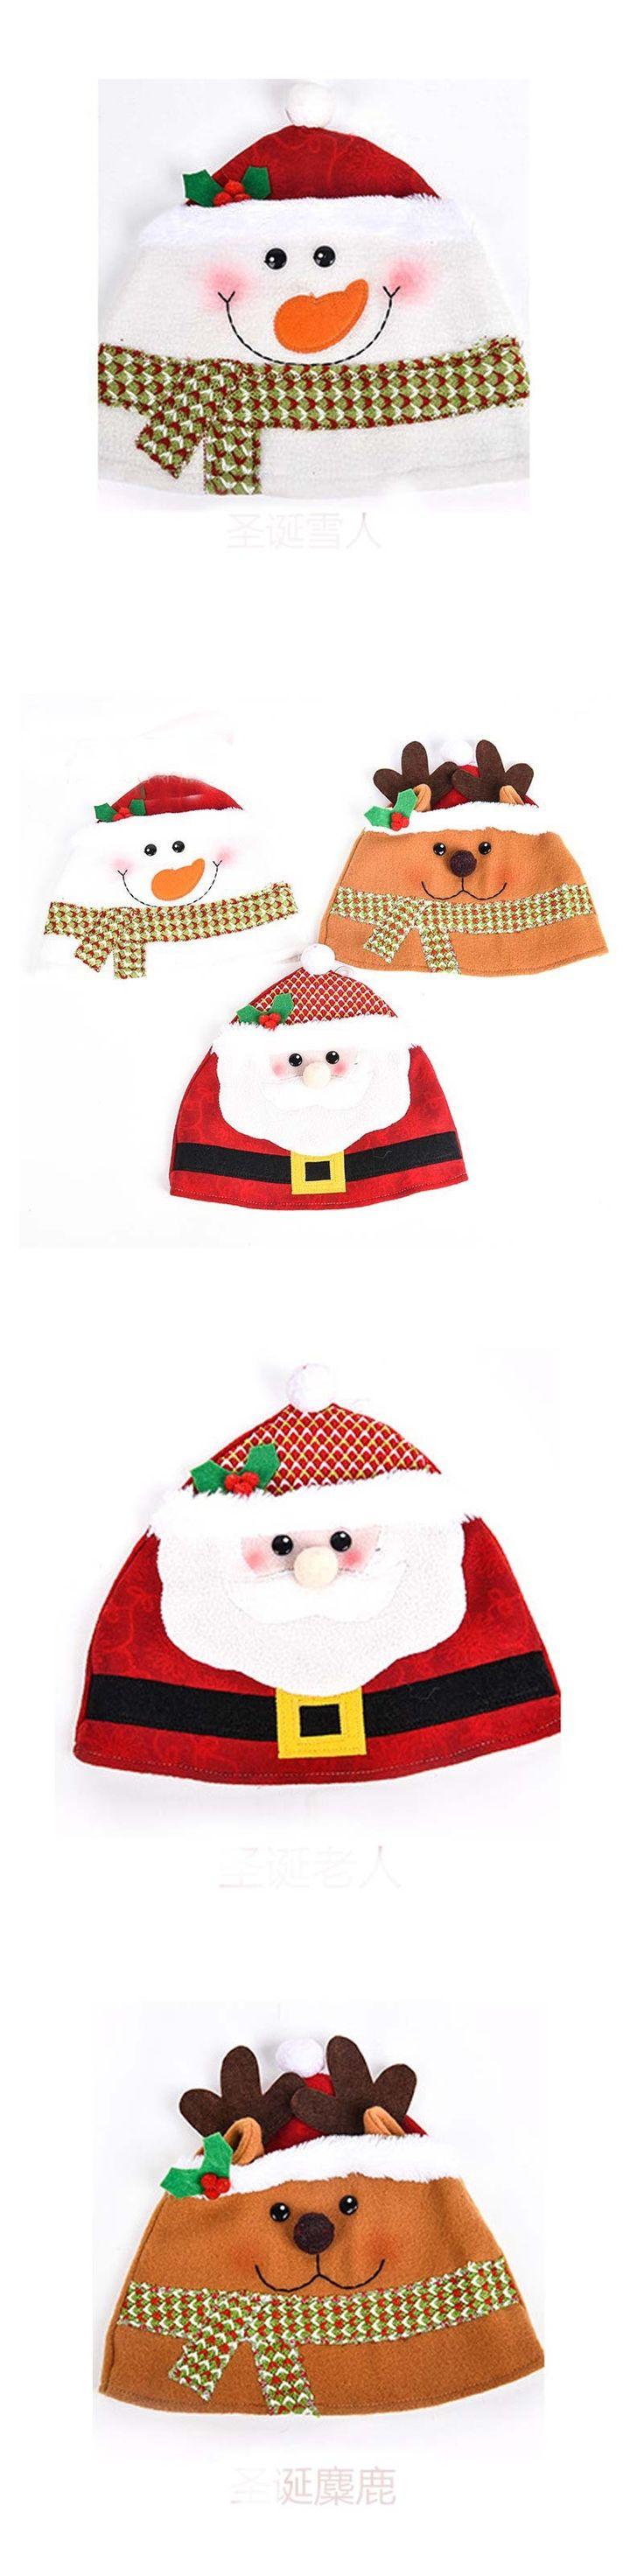 Christmas Day Snowman Hat Beanies For Adult Women Men Santa Claus Winter Warm Ear Cap Skullies